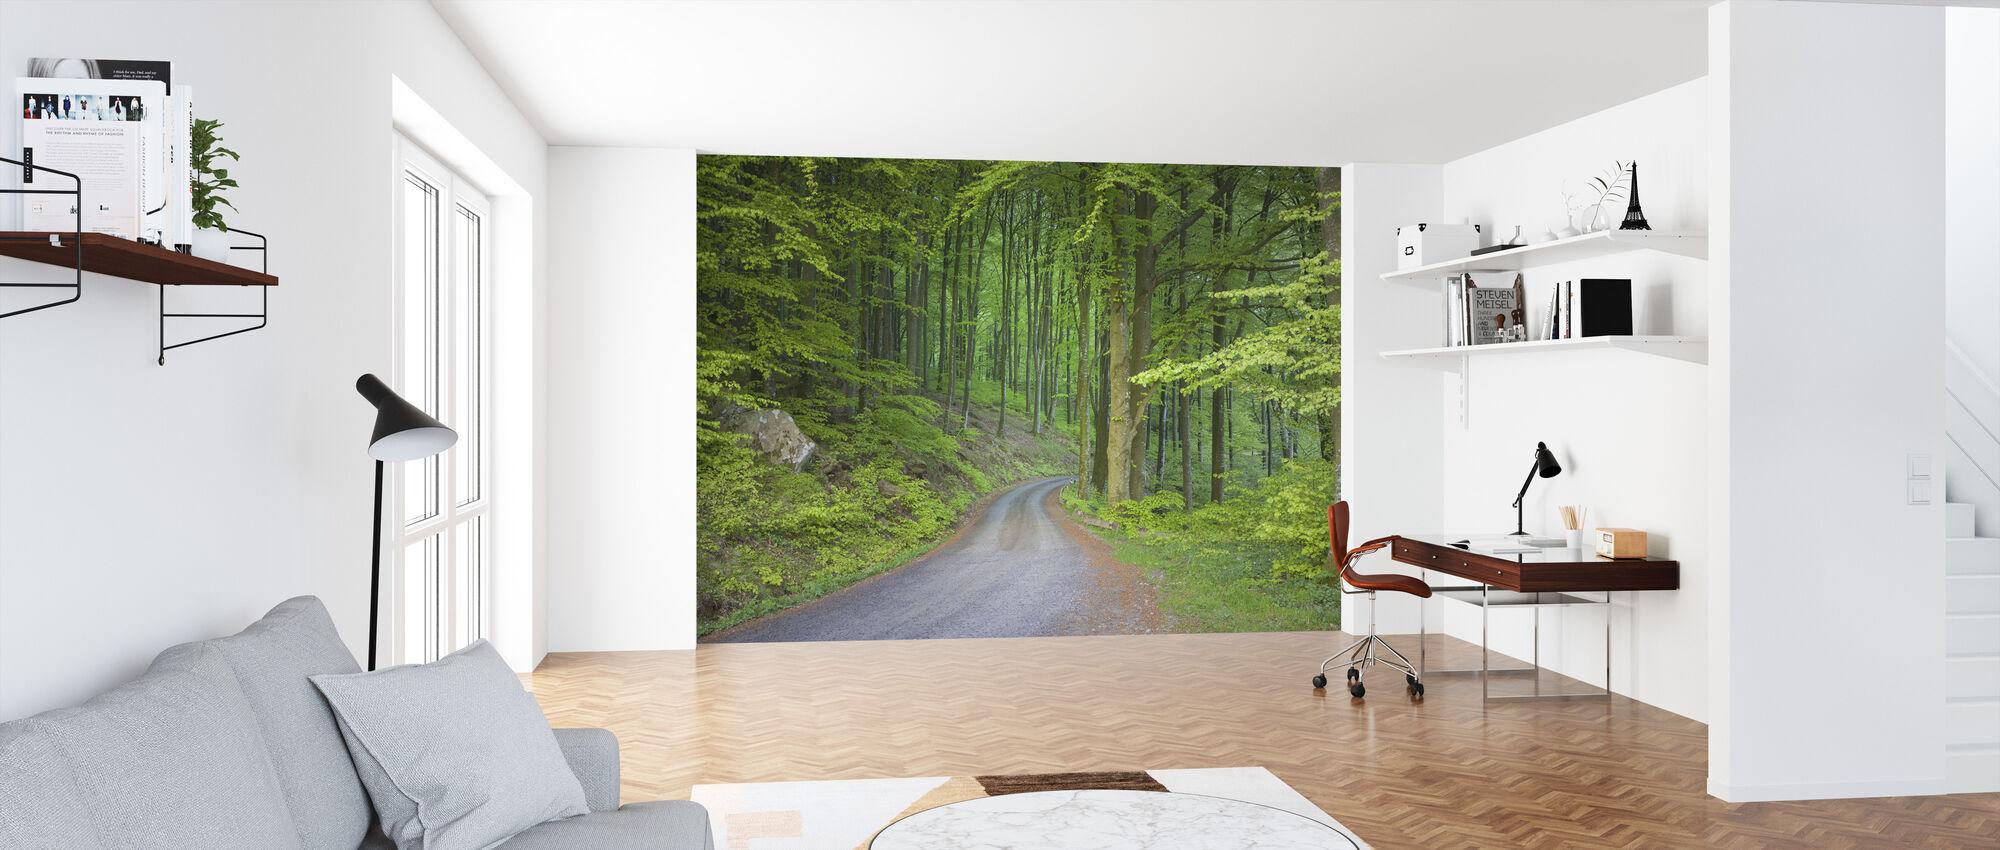 Beech Forest Road - Wallpaper - Office